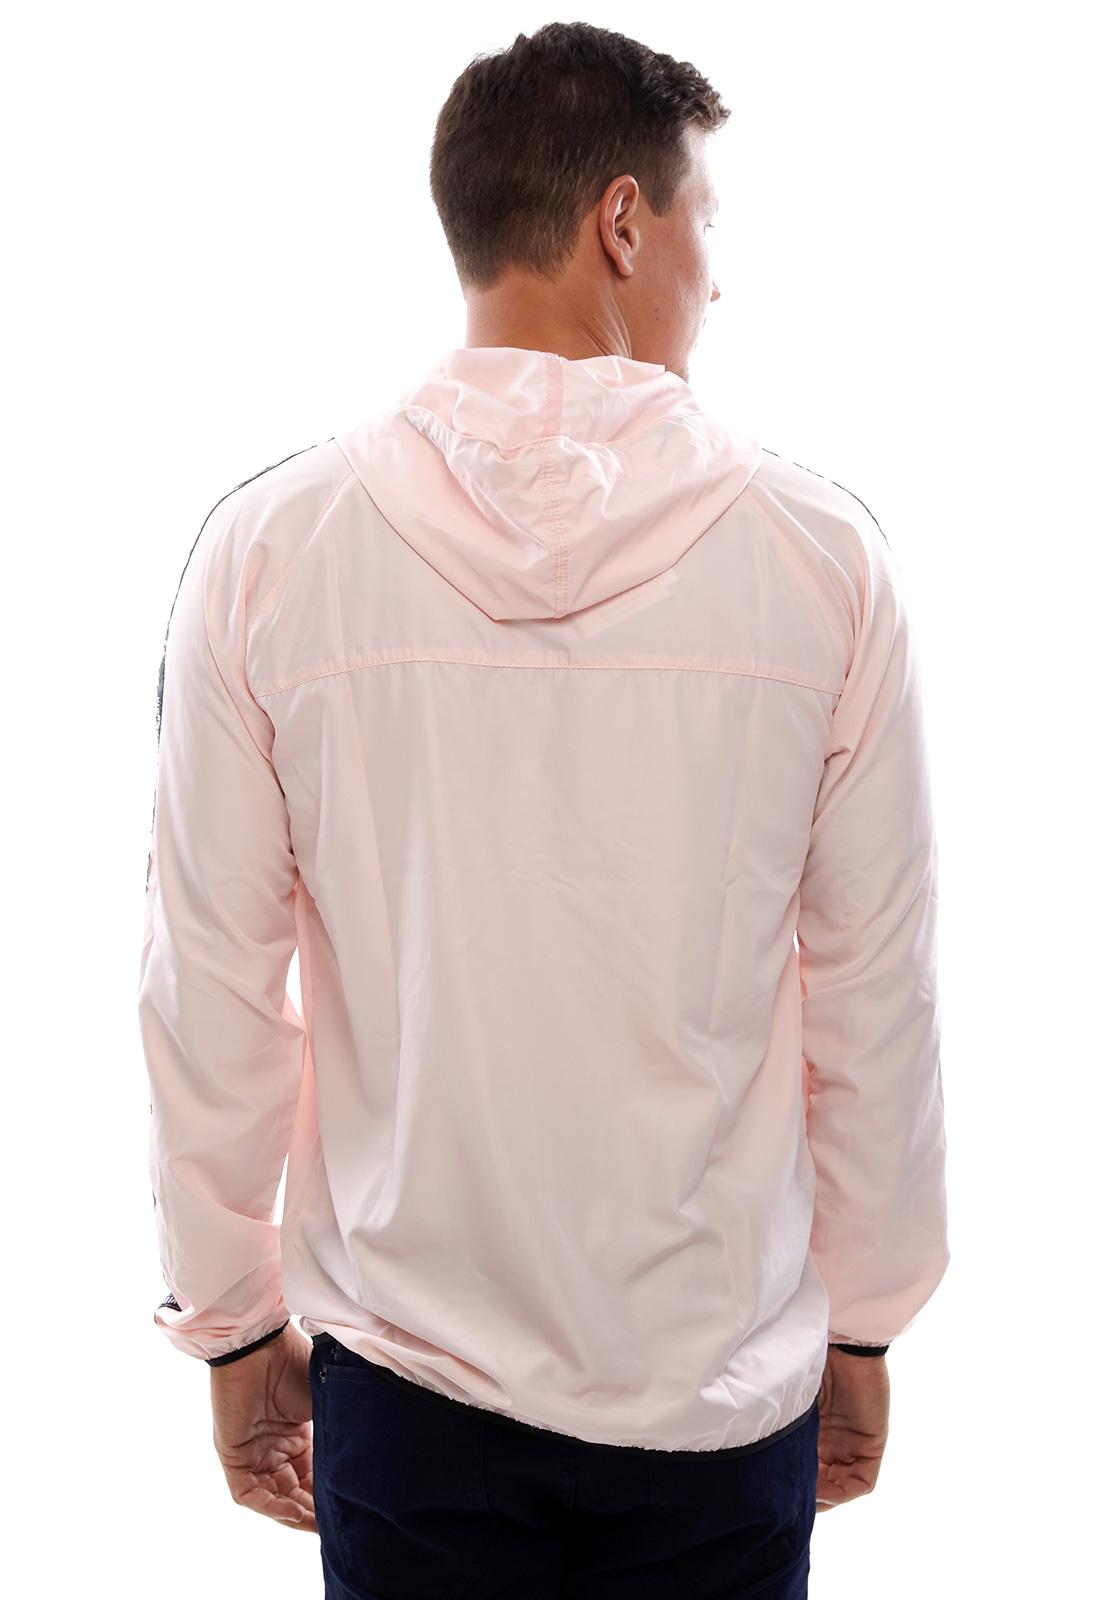 Jaqueta Corta Vento Vida Marinha Microfibra Rosa Claro com Capuz